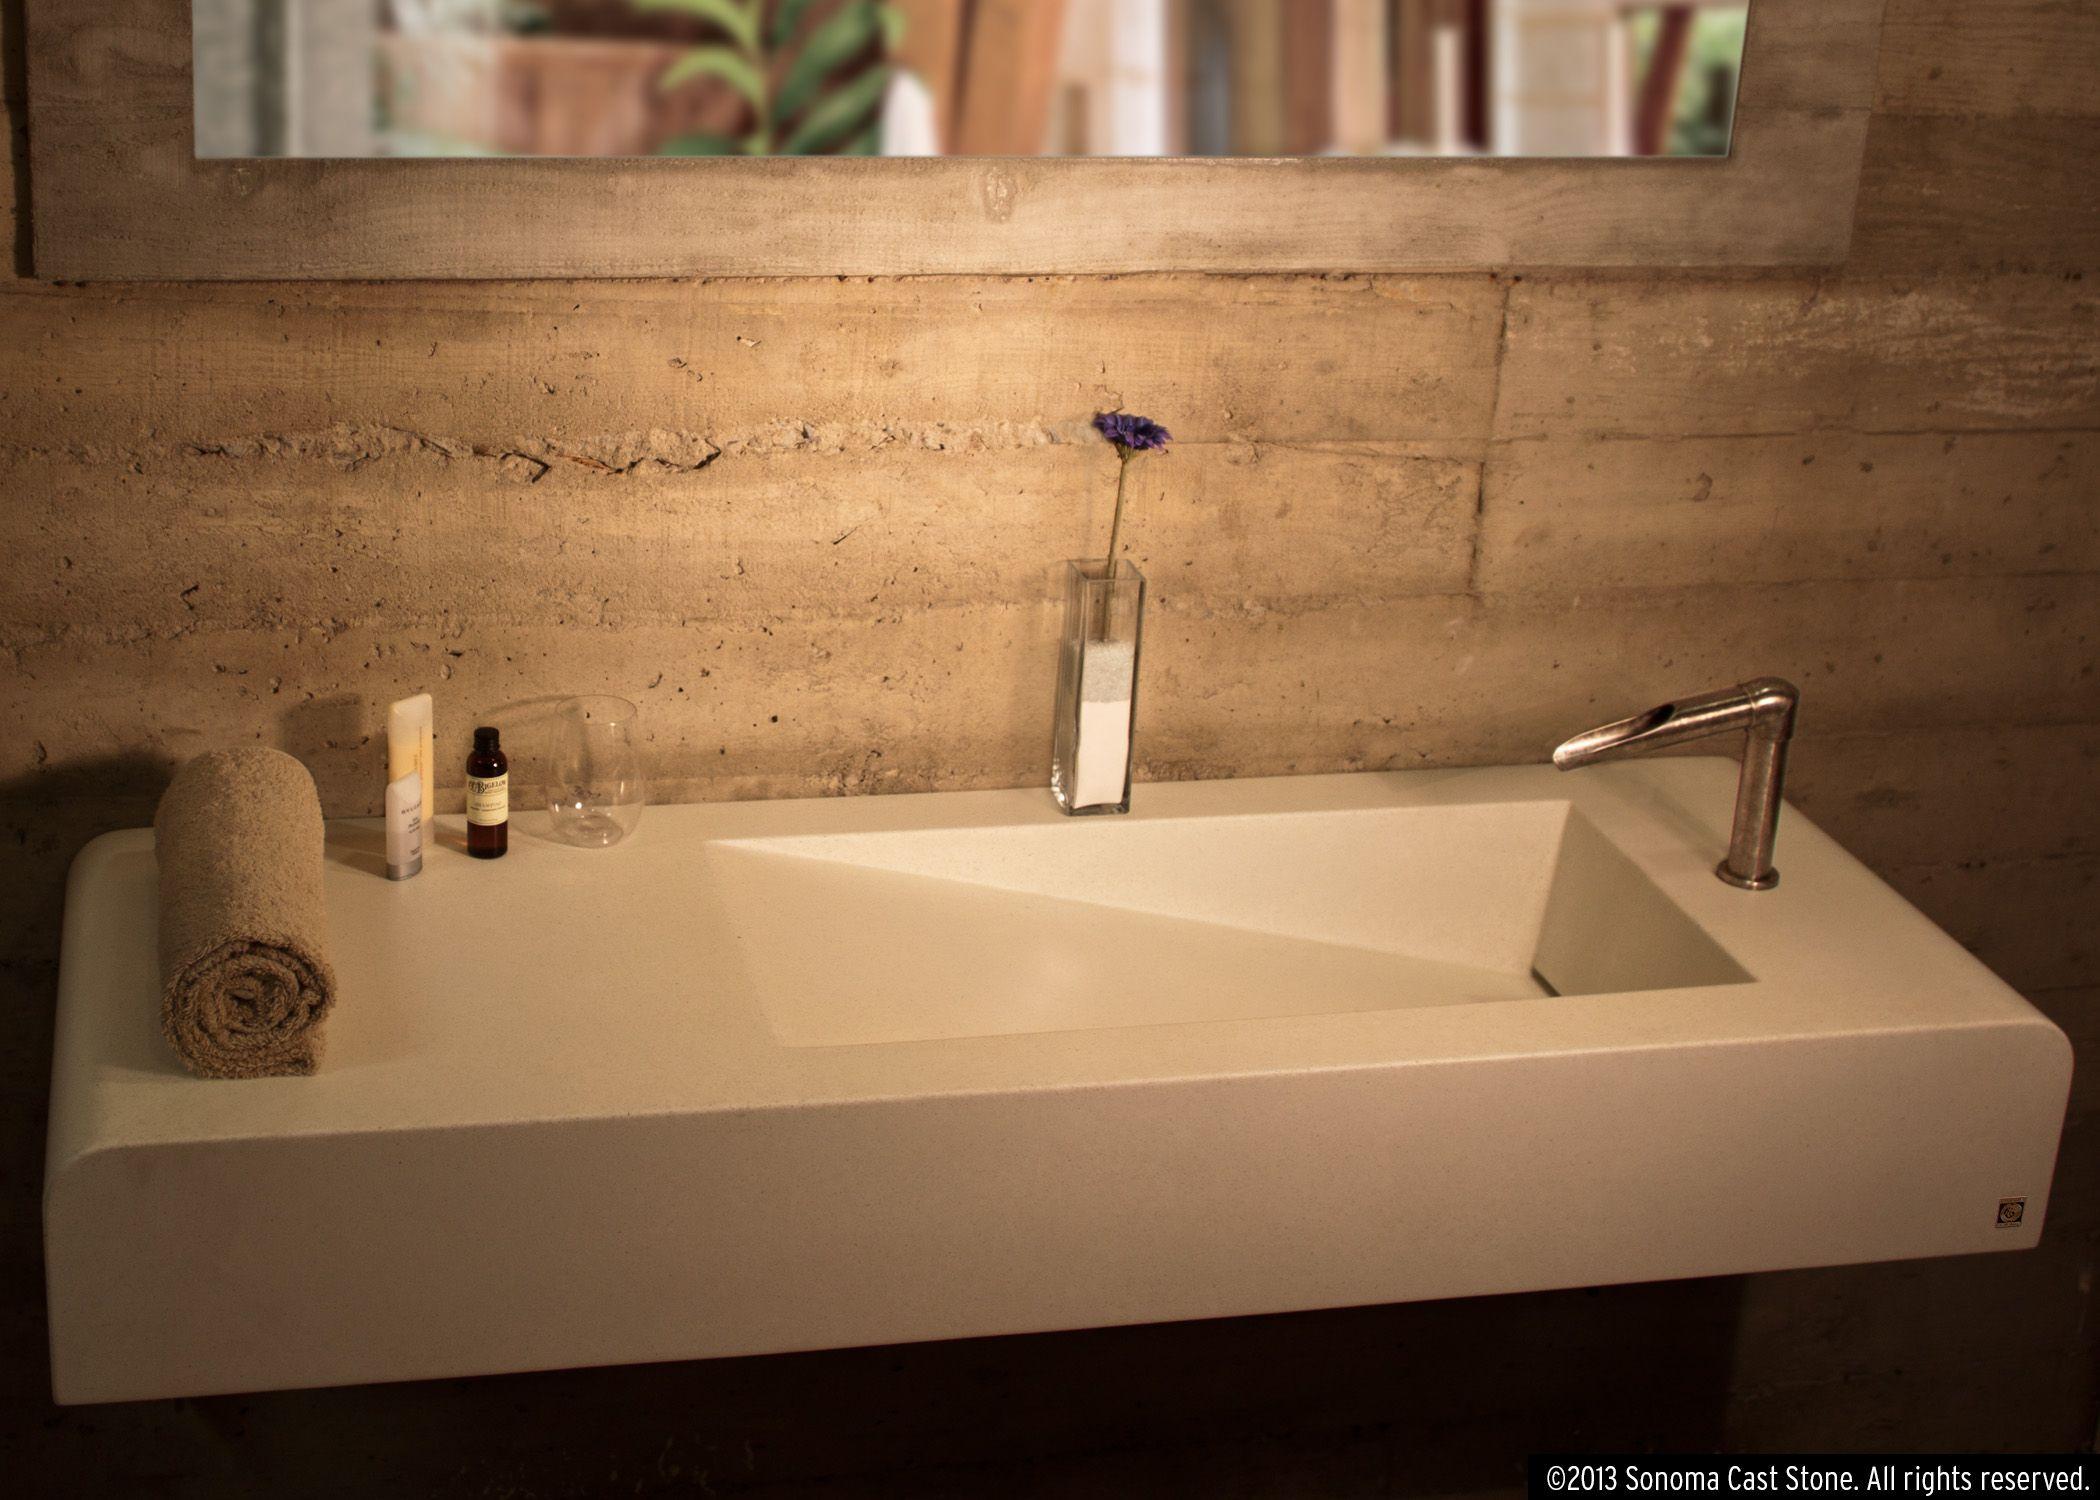 Concrete Sinks And Countertops For Public Restrooms Concrete